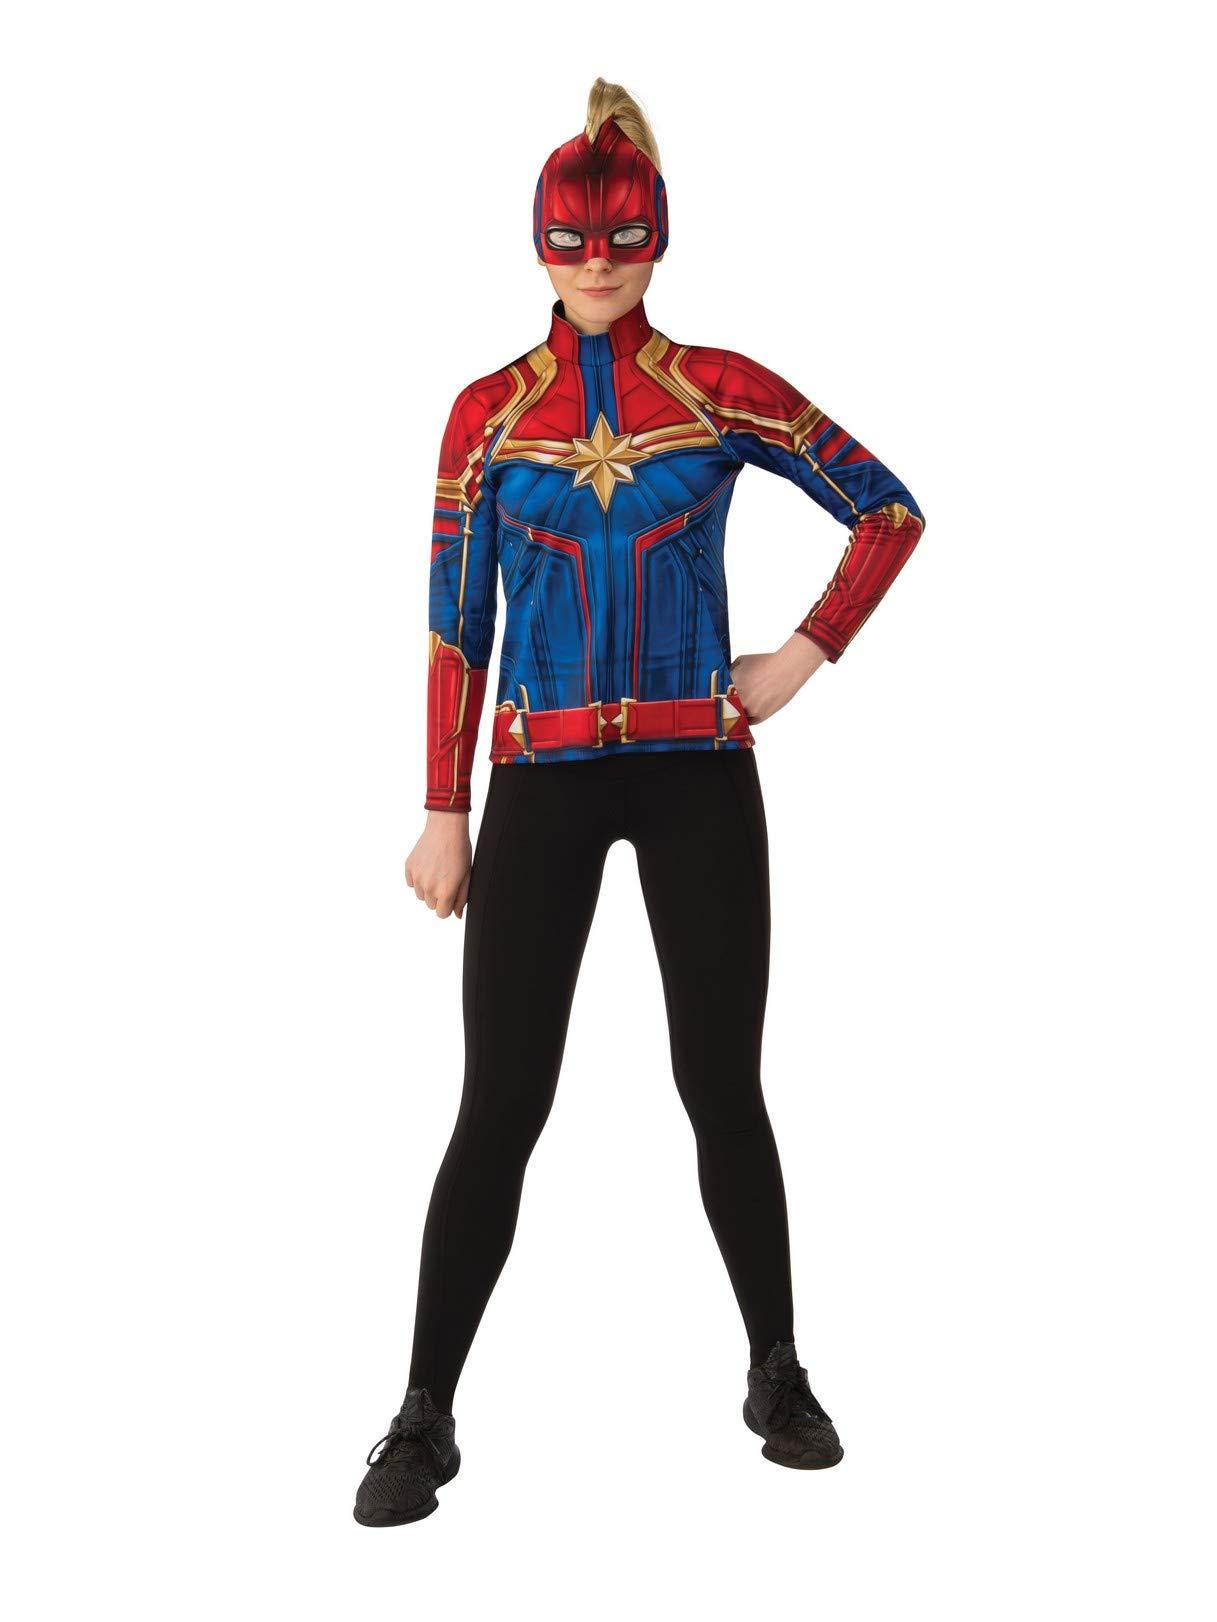 Rubie S Costume Co Women S Captain Marvel Hero Top And Headpiece Funtober Captain marvel female superhero costumes marvel and marvel dresses. funtober